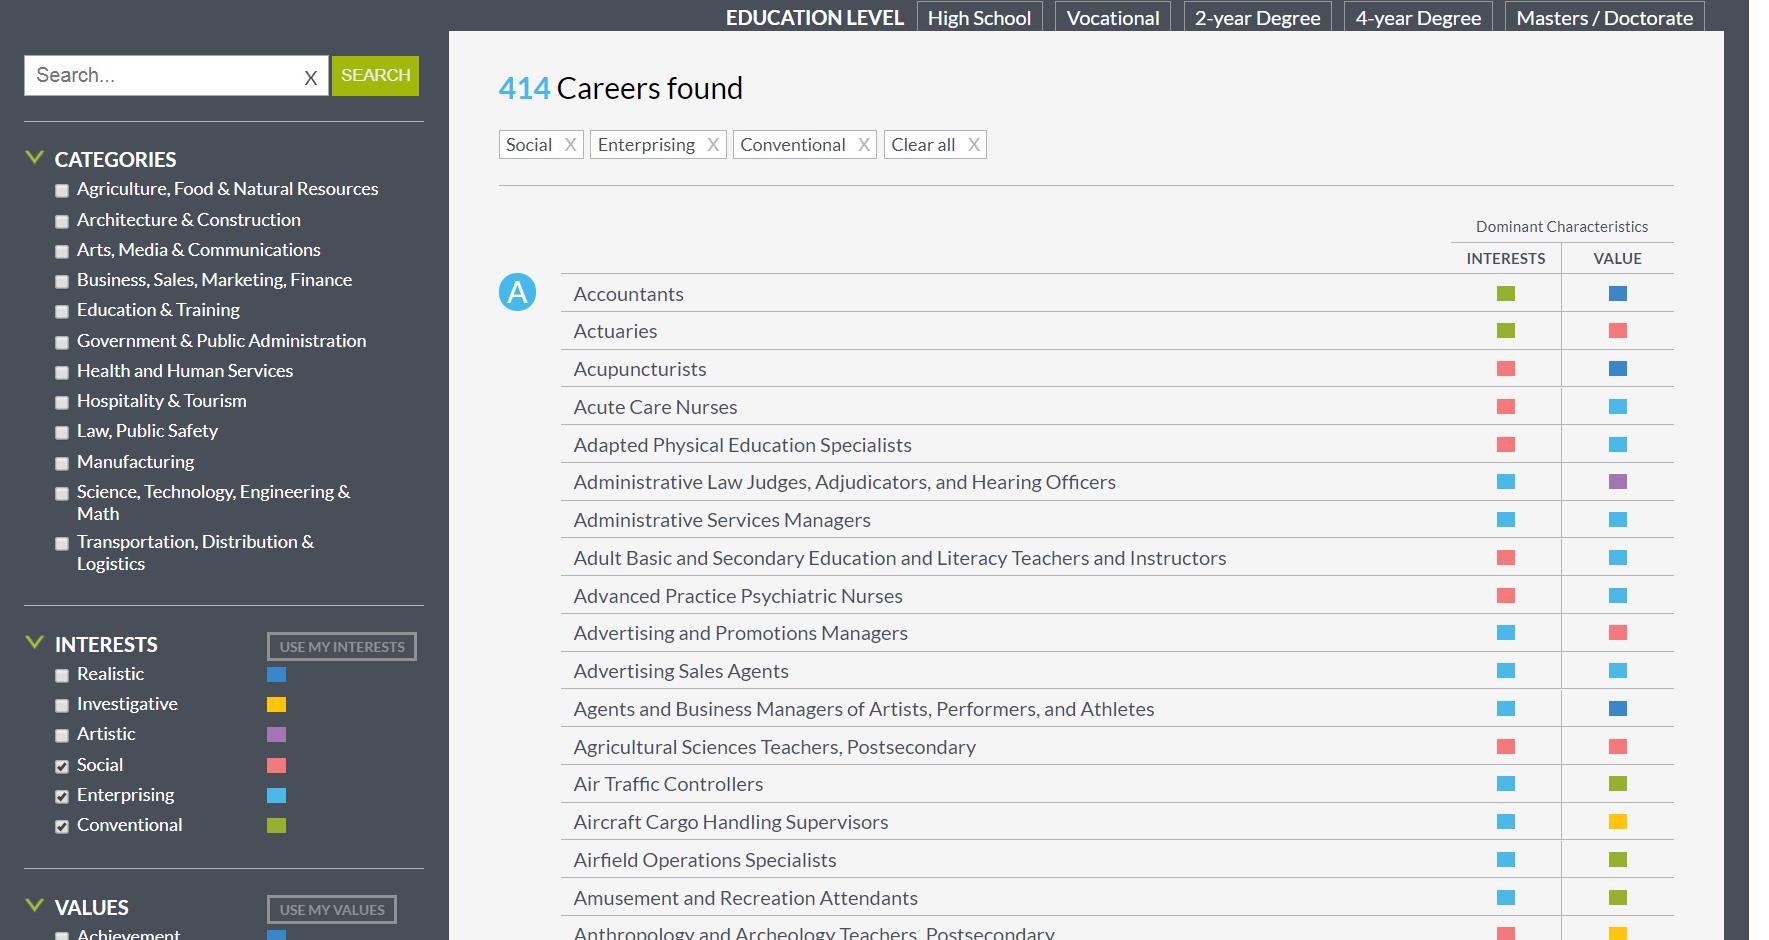 MEFA Pathway Career Search List